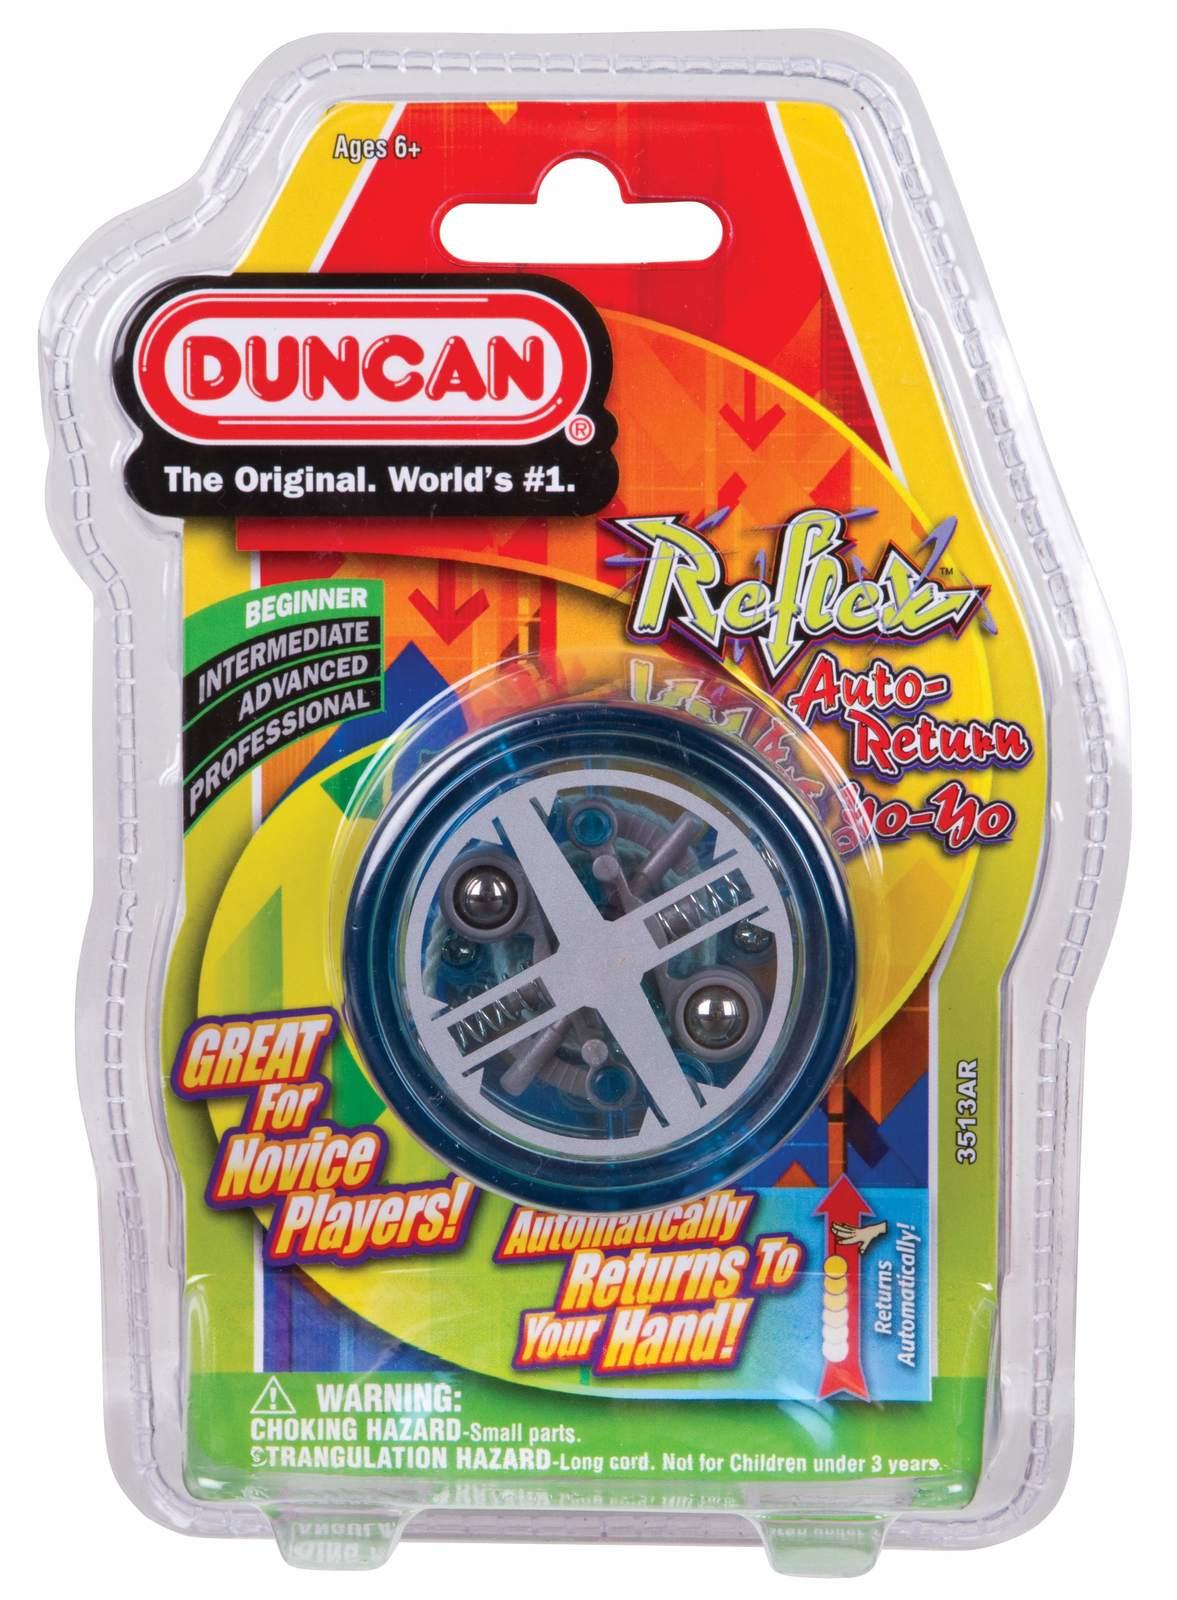 Duncan: Reflex - Auto Return Yo-Yo - Assorted Colours image